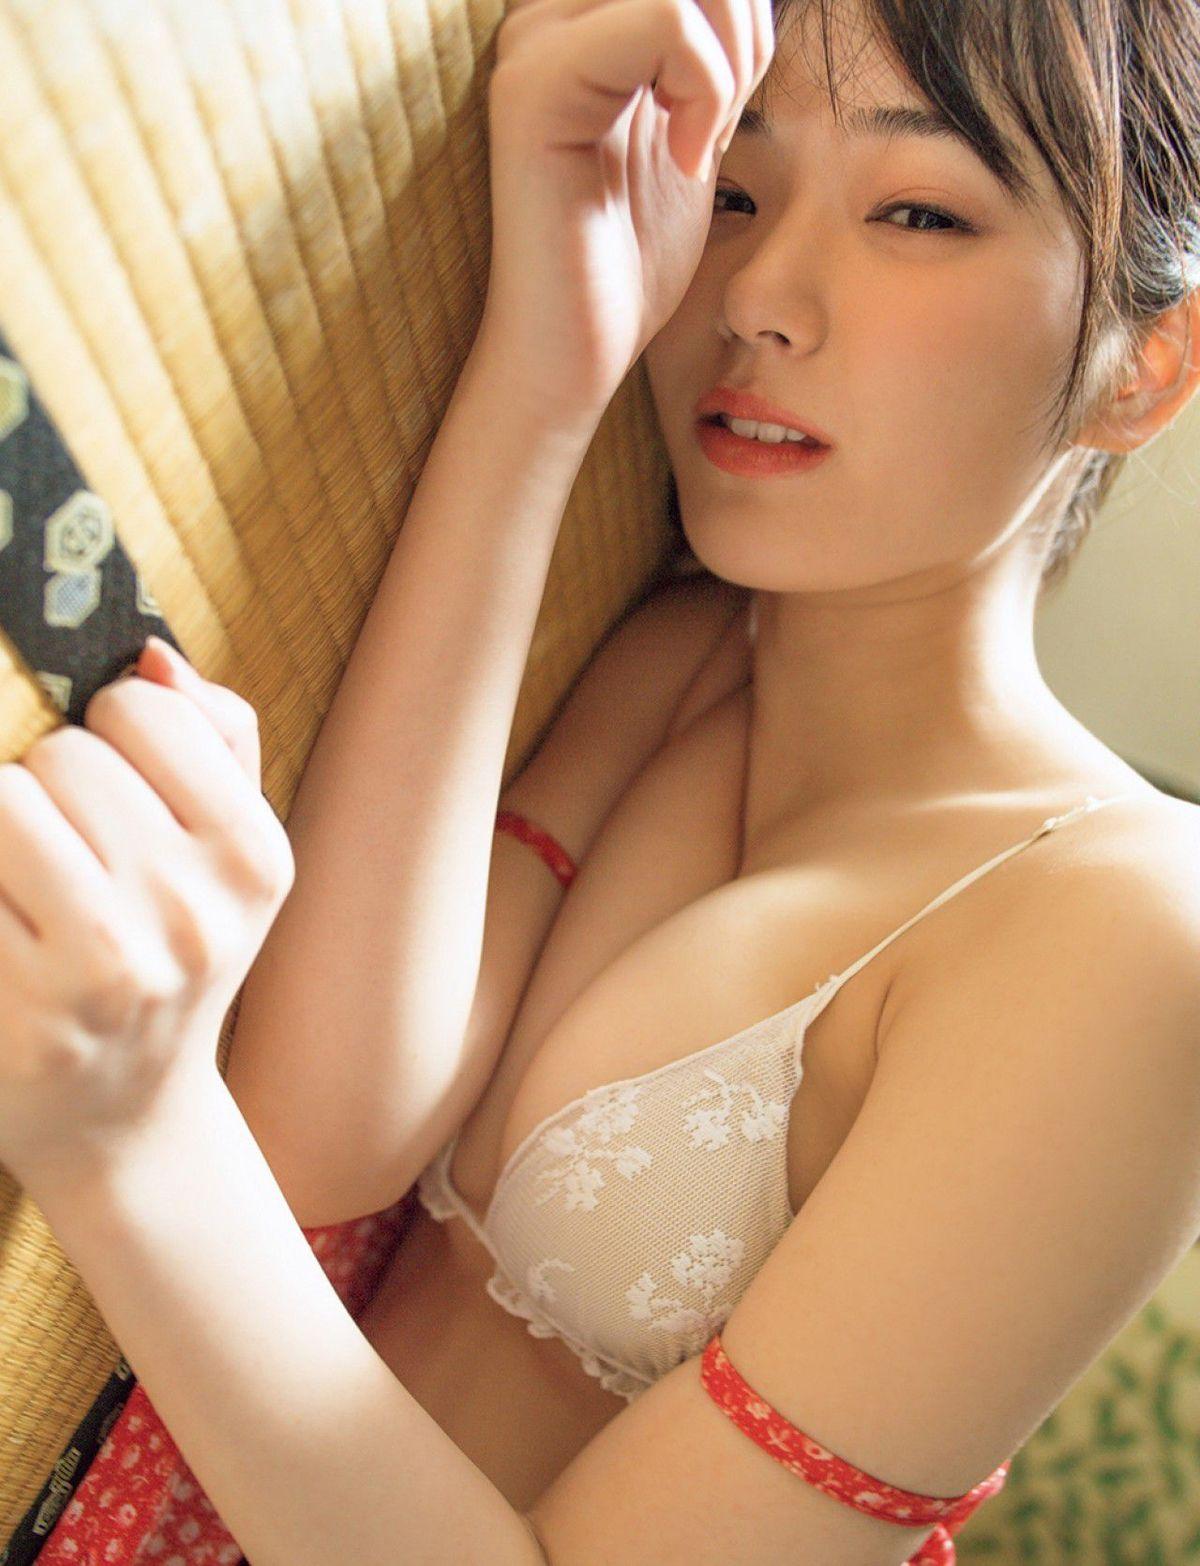 [FRIDAY] 長谷川かすみの 《「Eカップ」今田耕司が「今、いちばん会いたい美女」と指名した話題美女の初水着(動画付き)》写真2